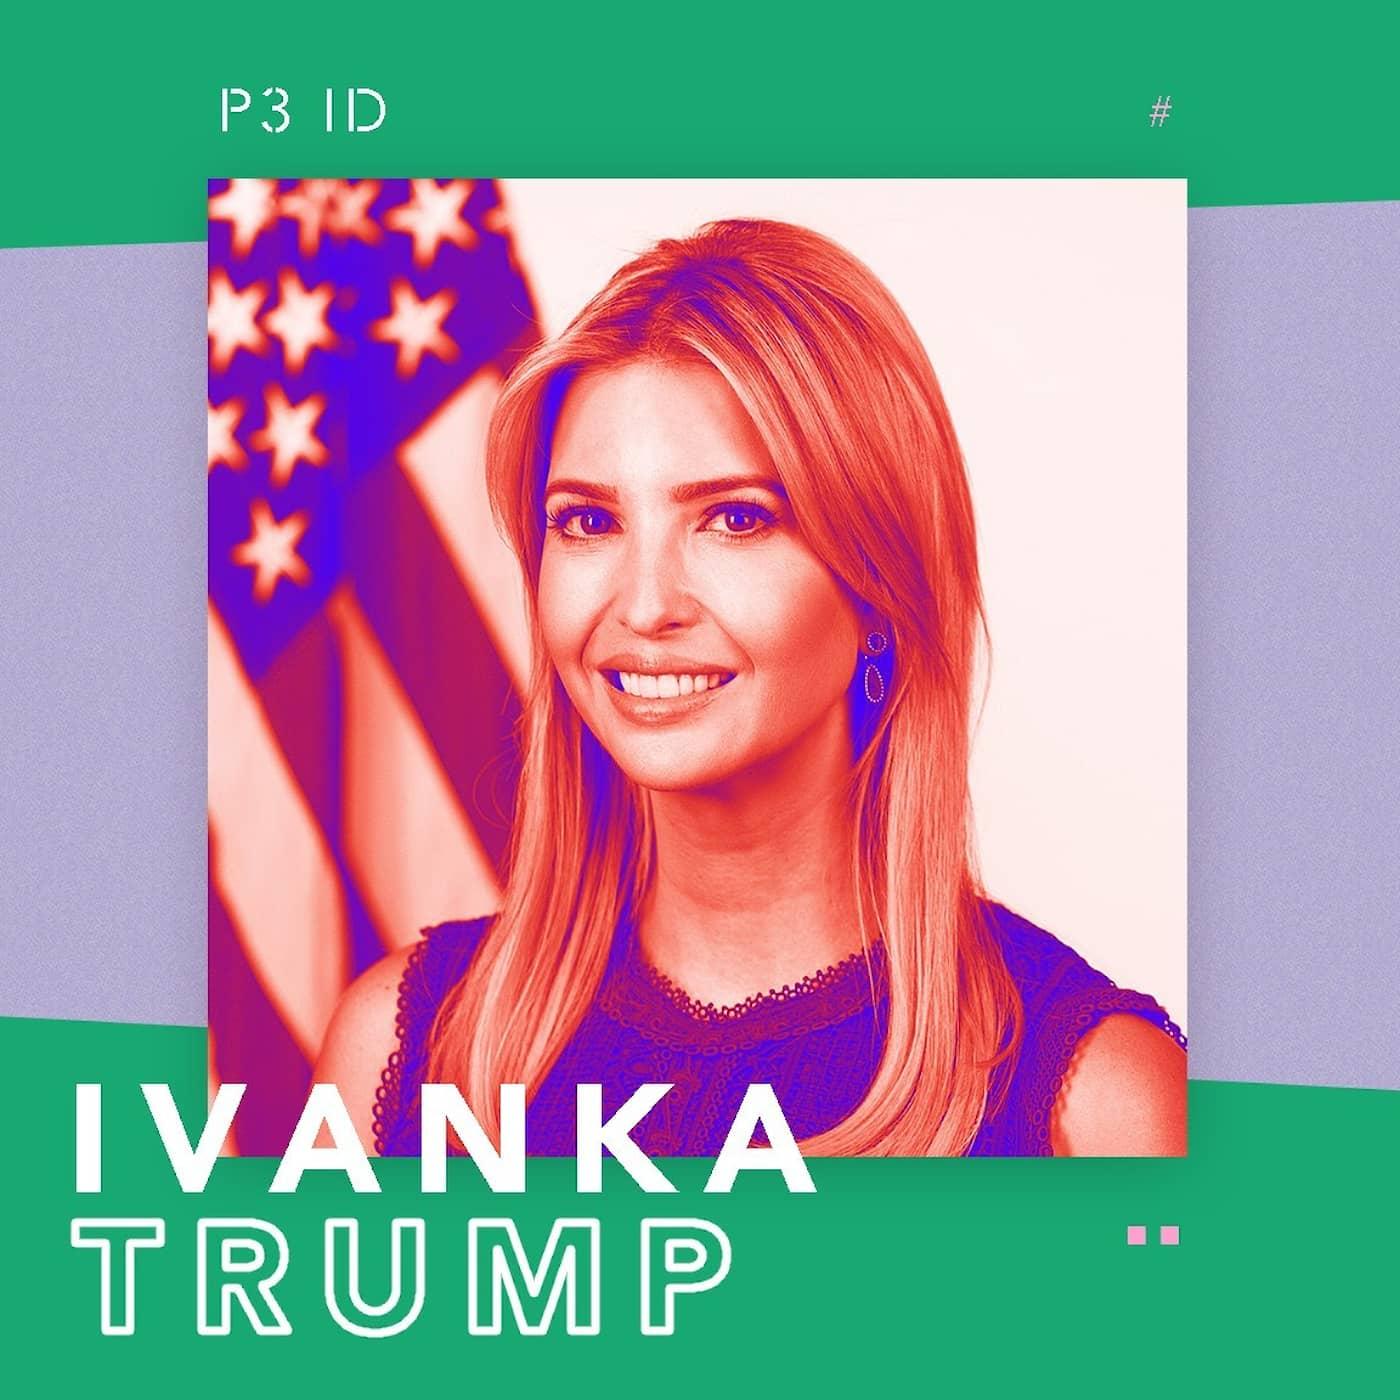 PODDTIPS: P3 ID om Ivanka Trump